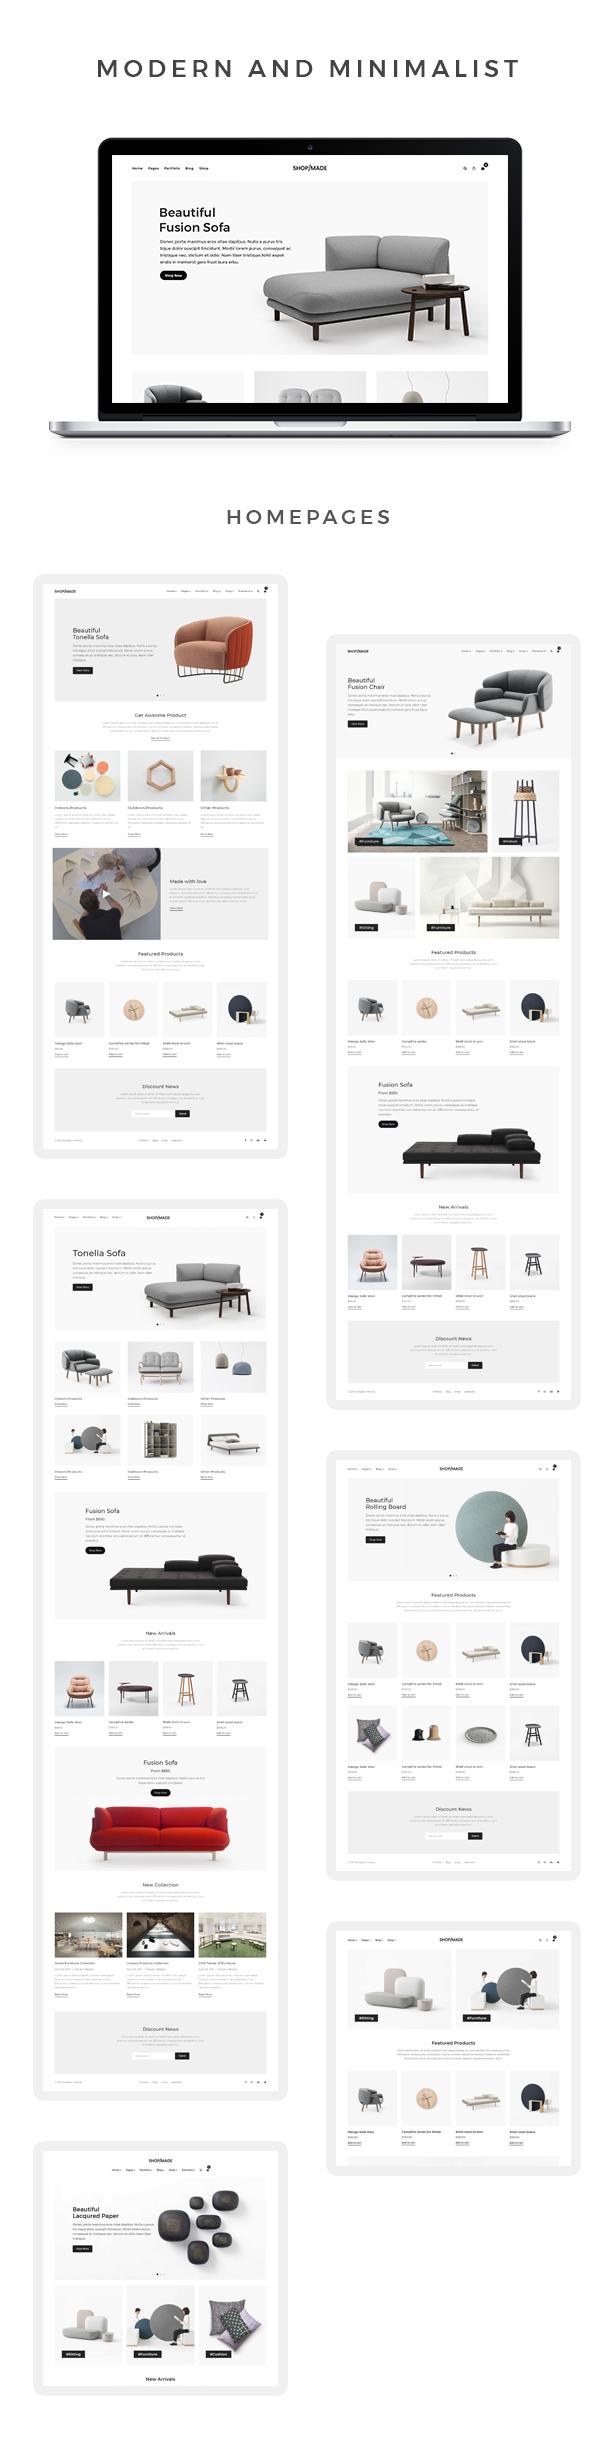 Dukandari – A Modern, Minimalist eCommerce Theme, Gobase64